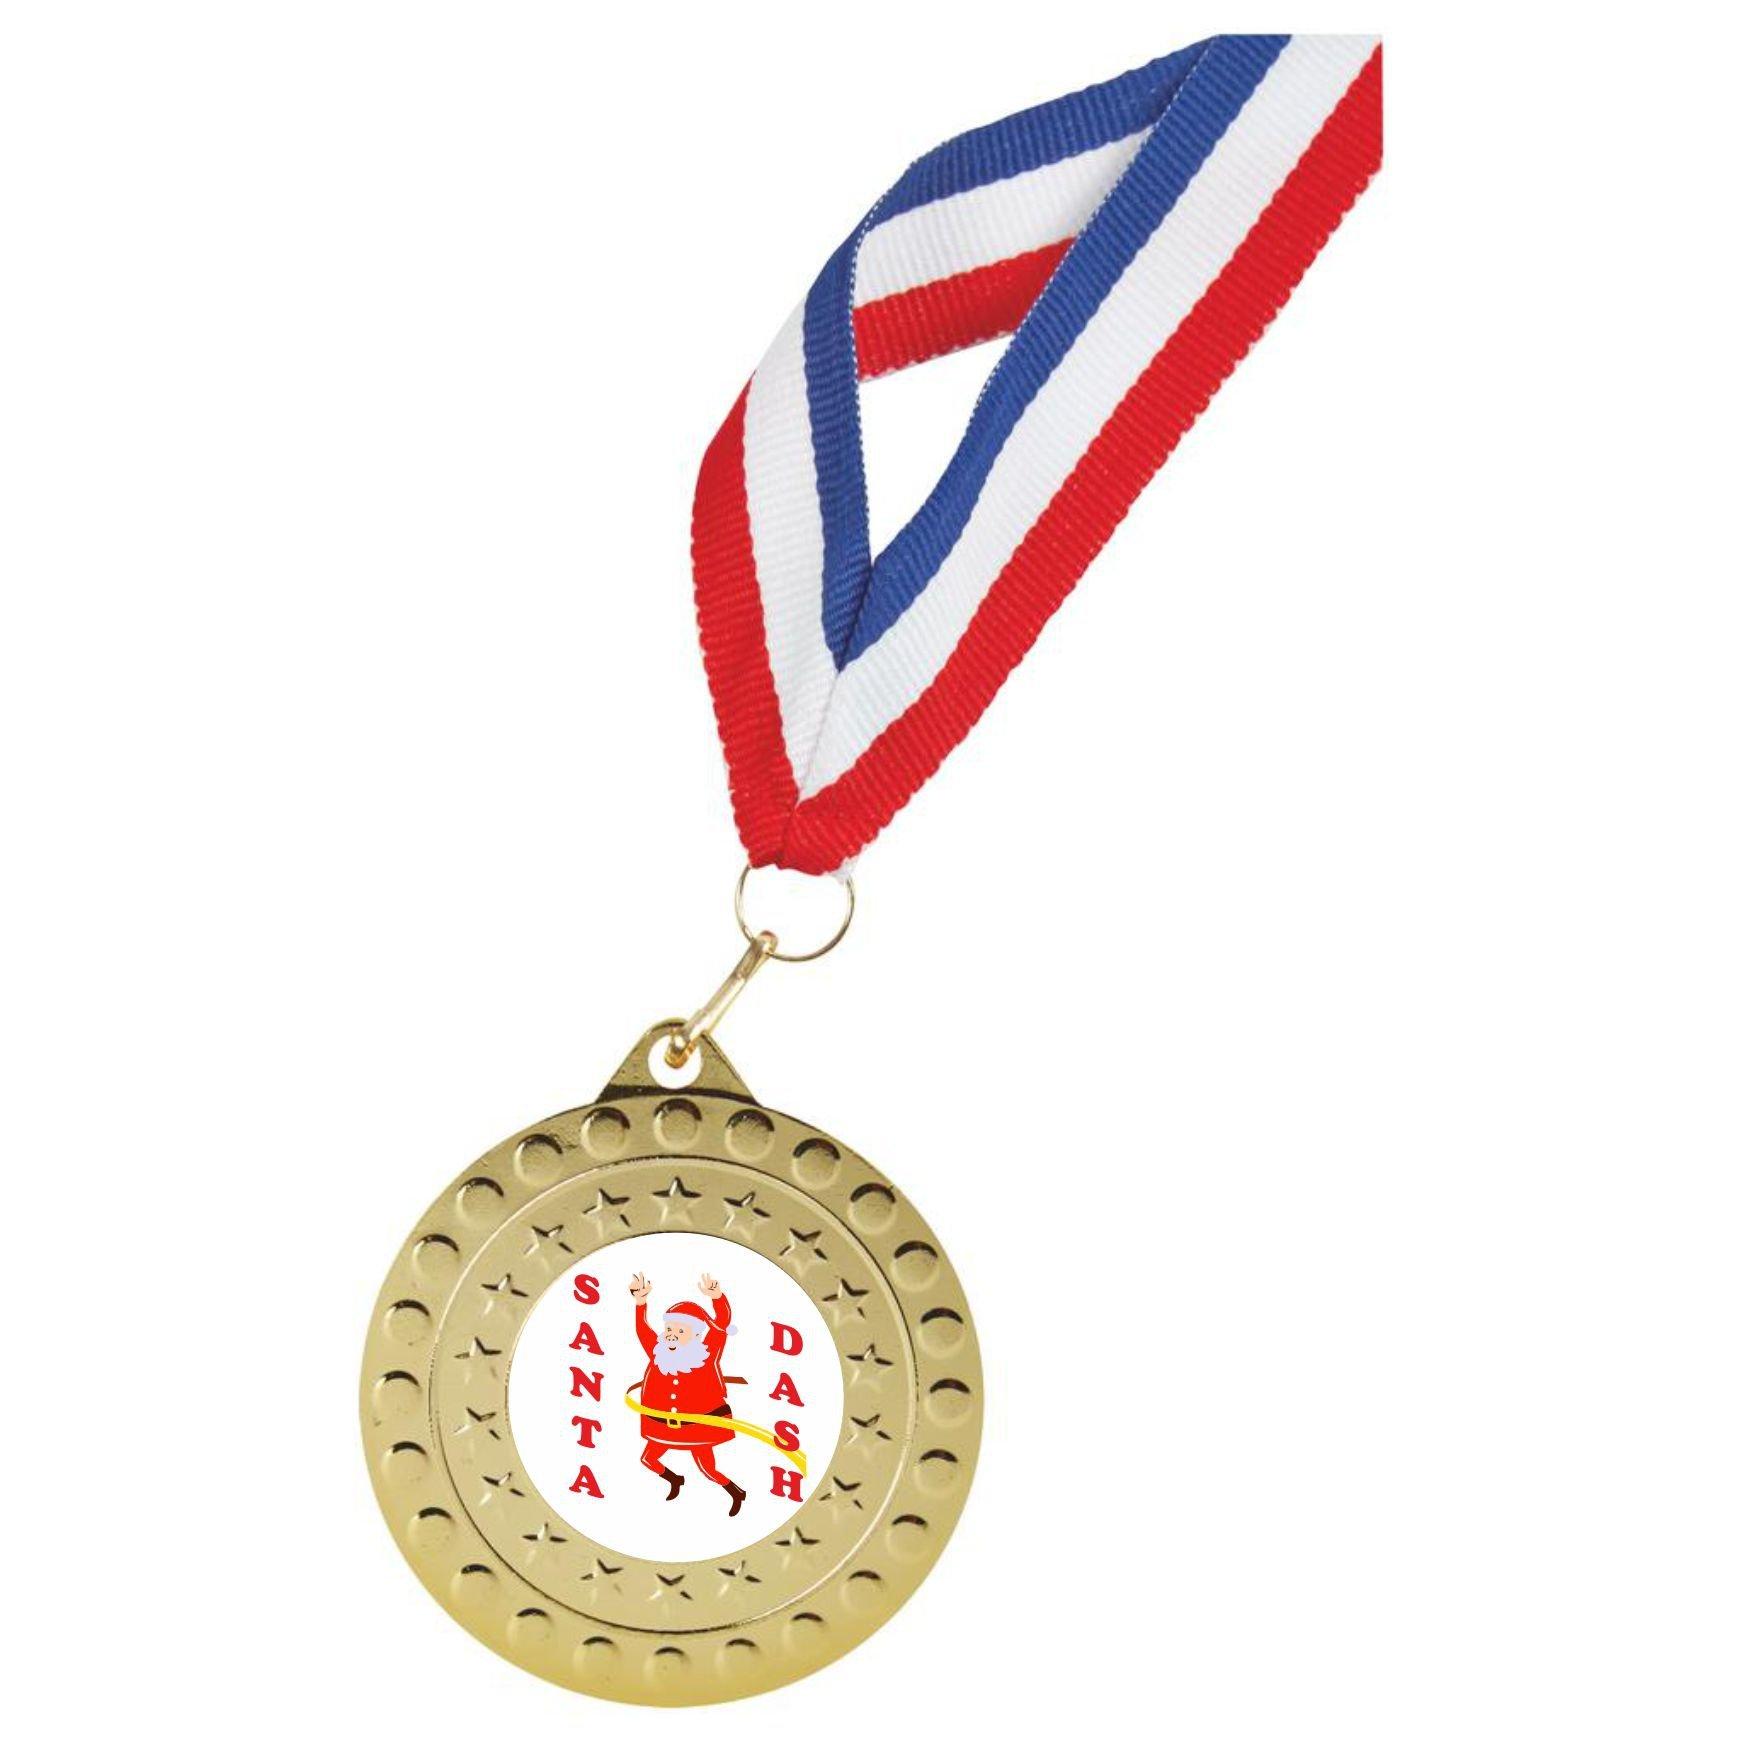 Medal and Ribbon Deals